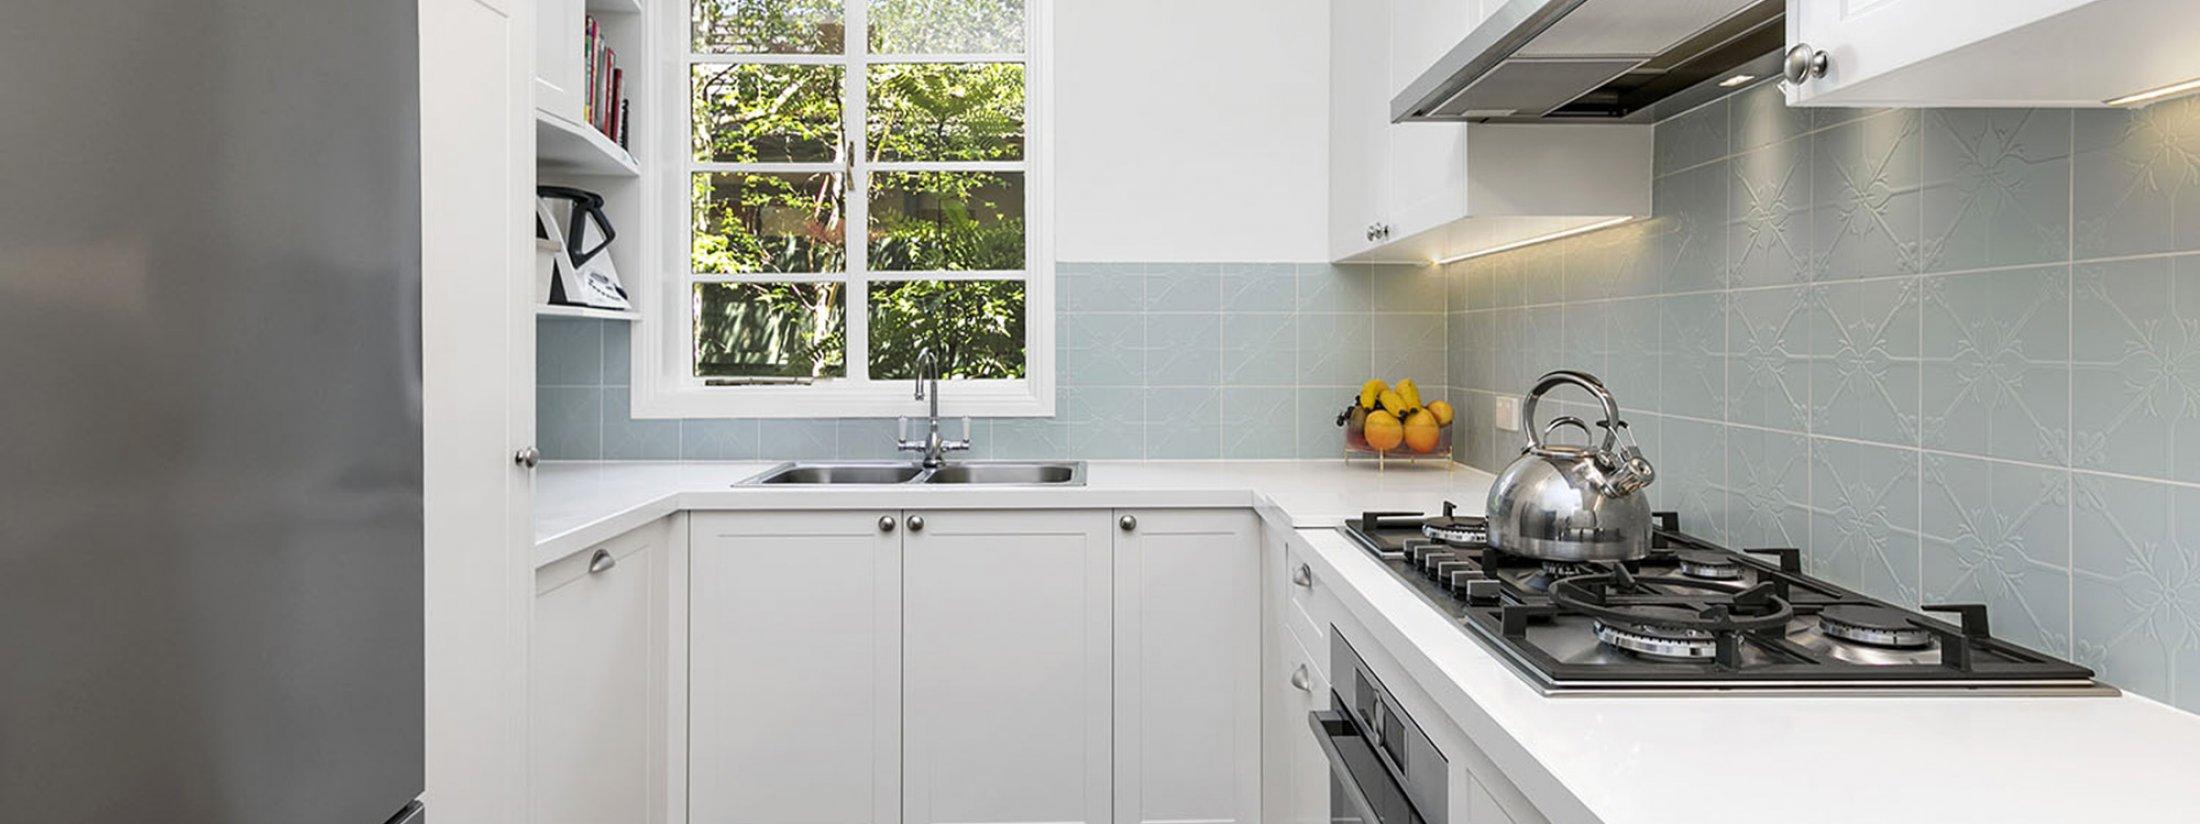 Frankies Place - Malvern - Kitchen